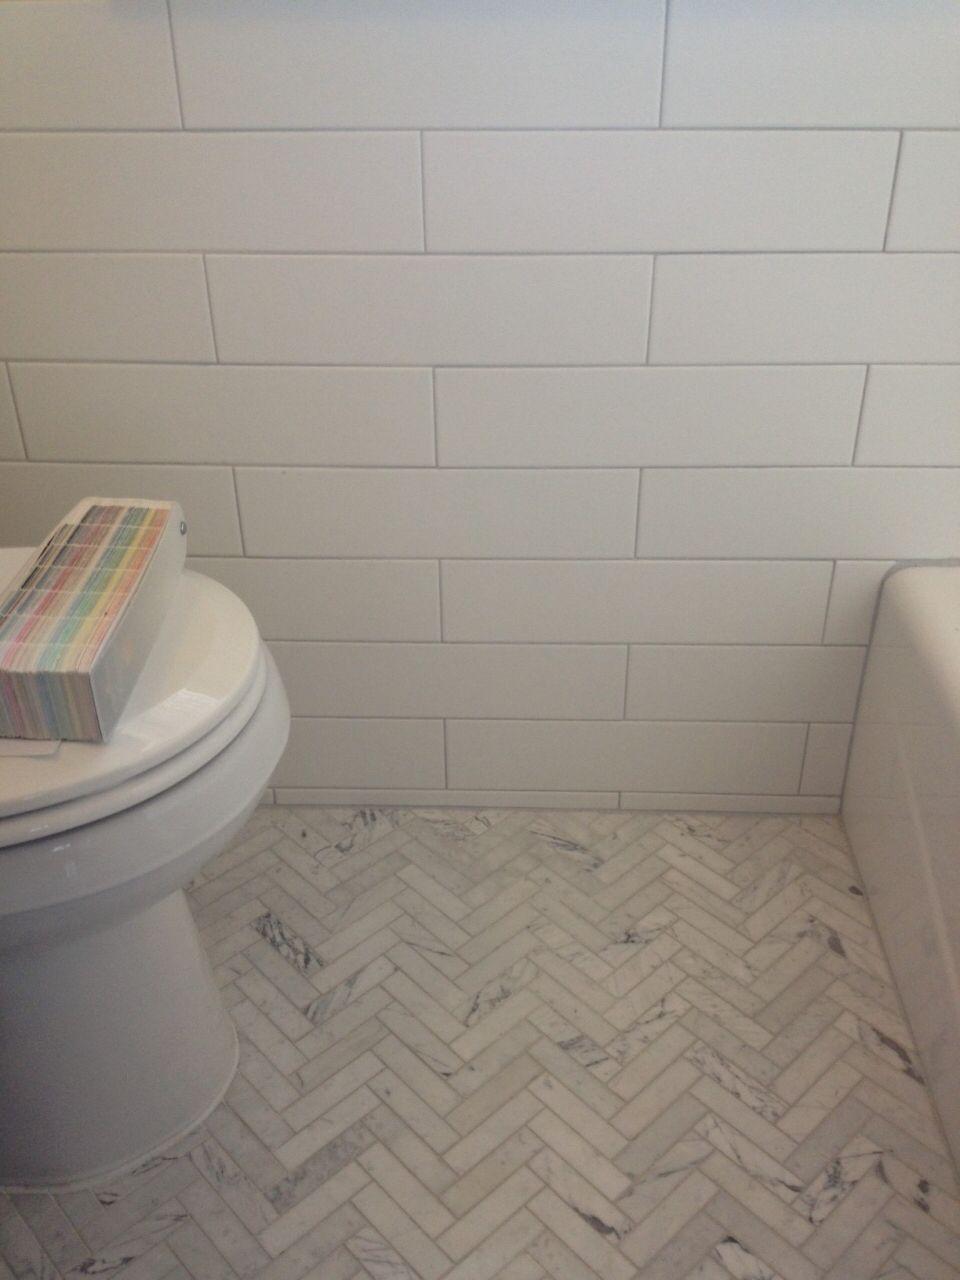 Herringbone Tile Floor And Subway Tile Walls Ceramic Tile Floor